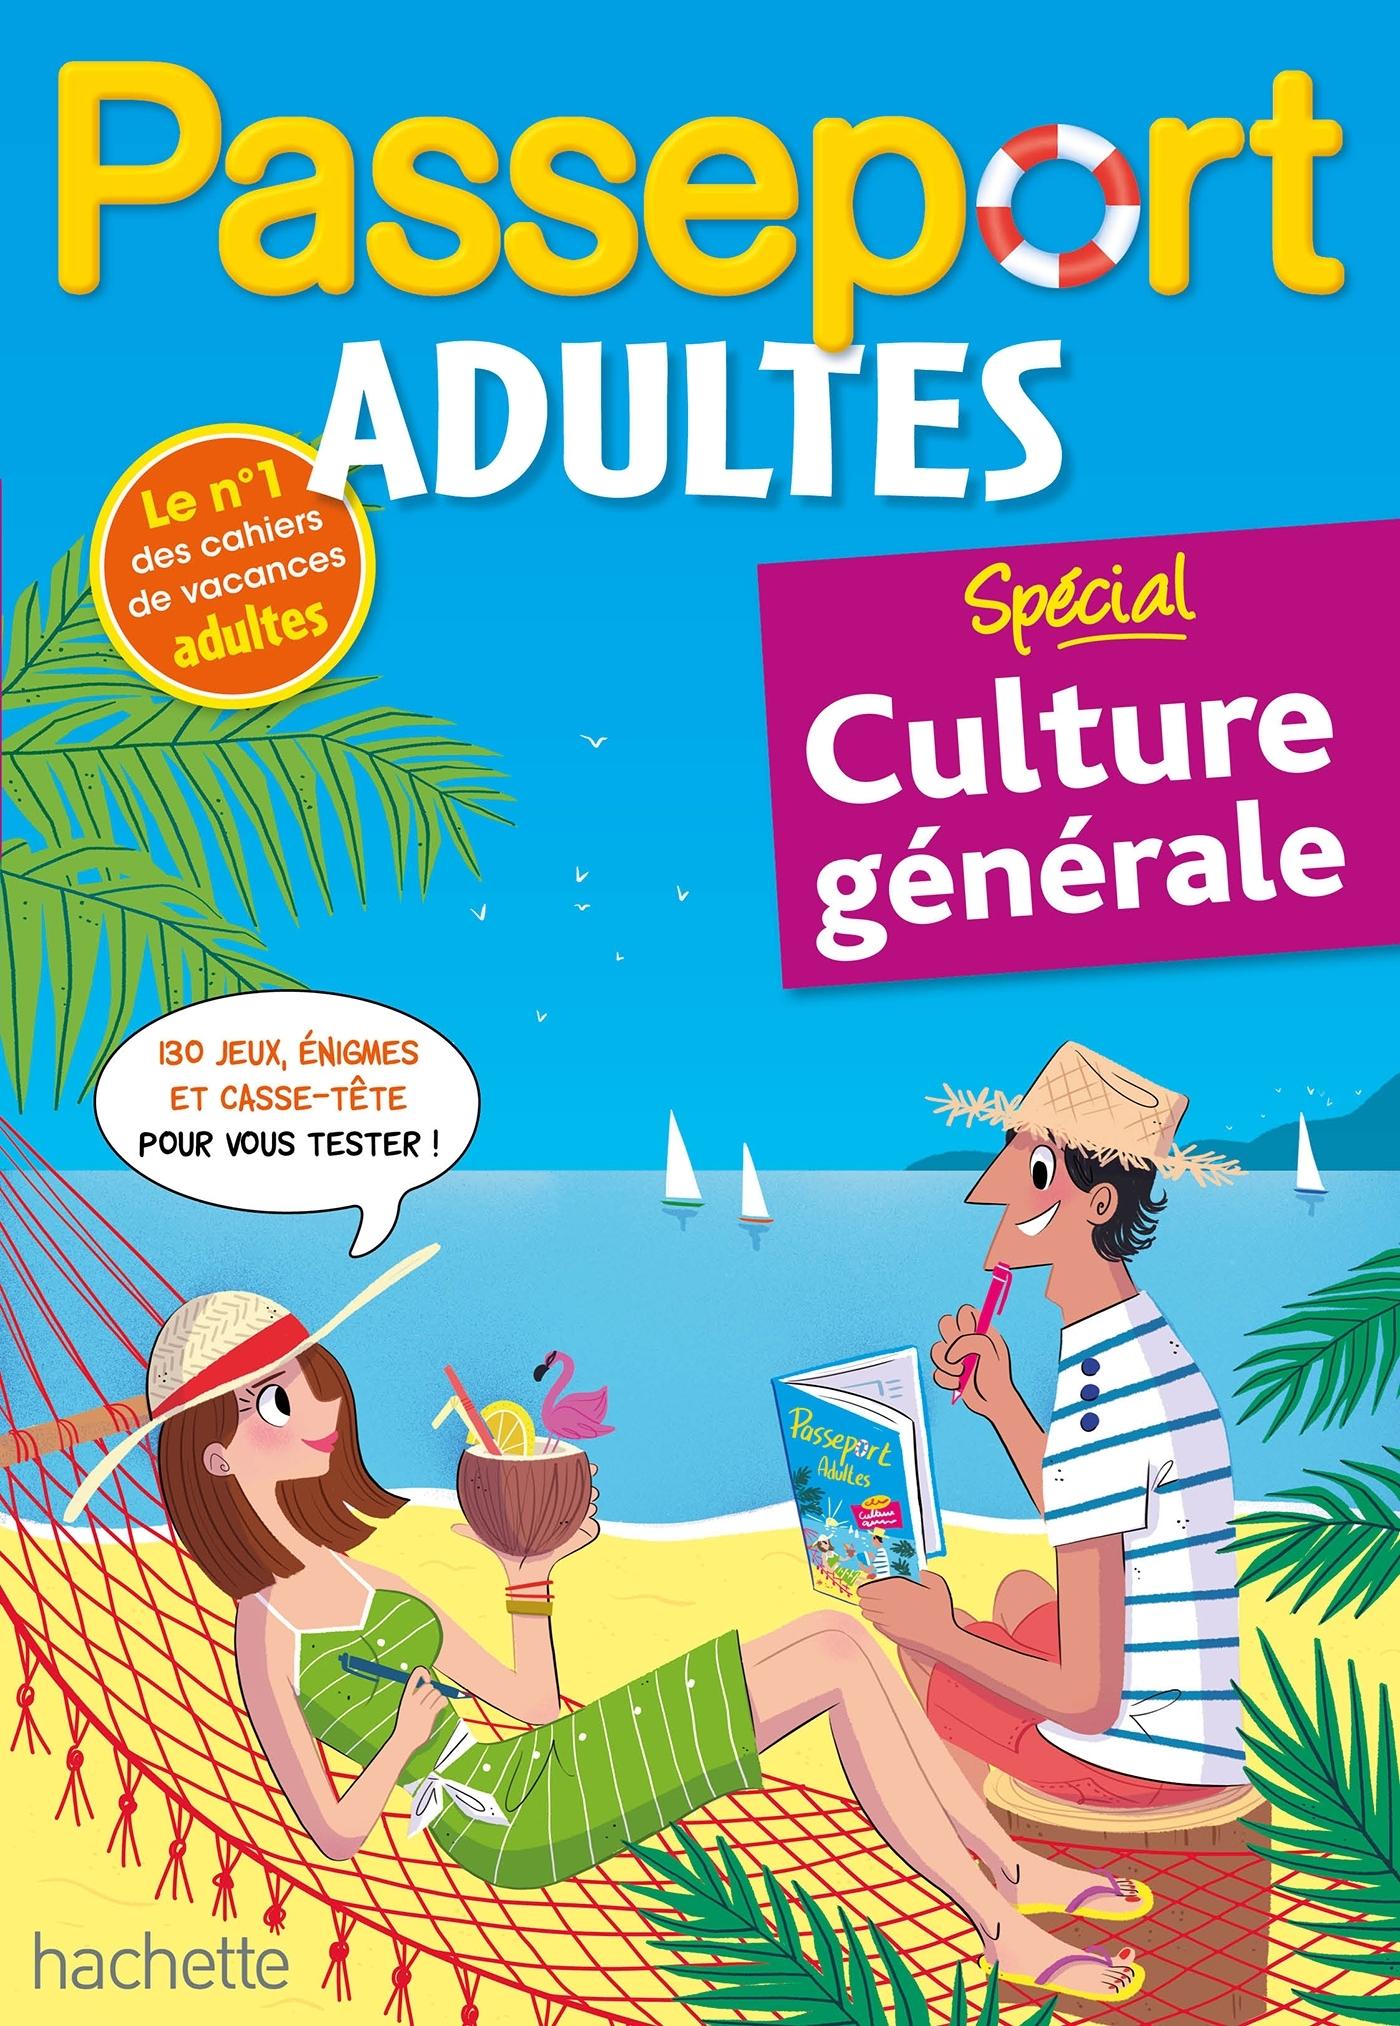 PASSEPORT ADULTES - SPECIAL CULTURE GENERALE